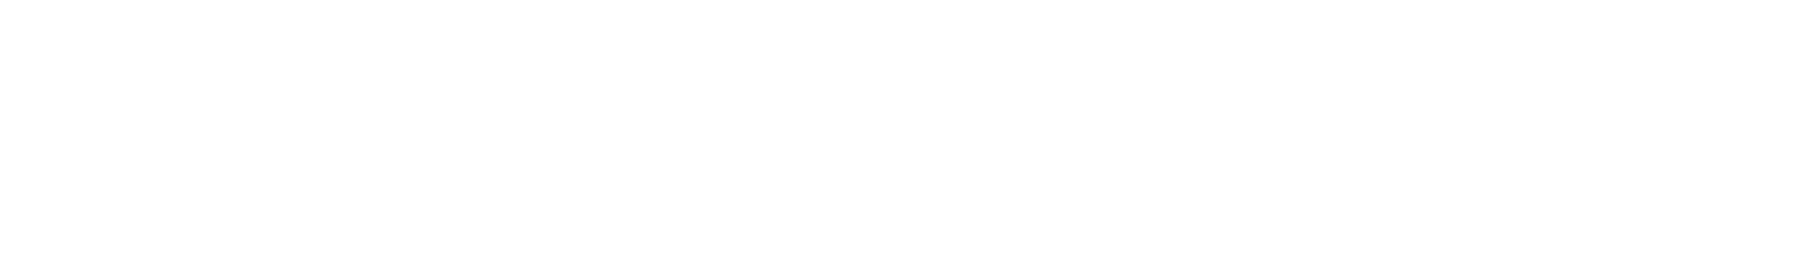 bluezone bc0210 percussion miscellaneous 002